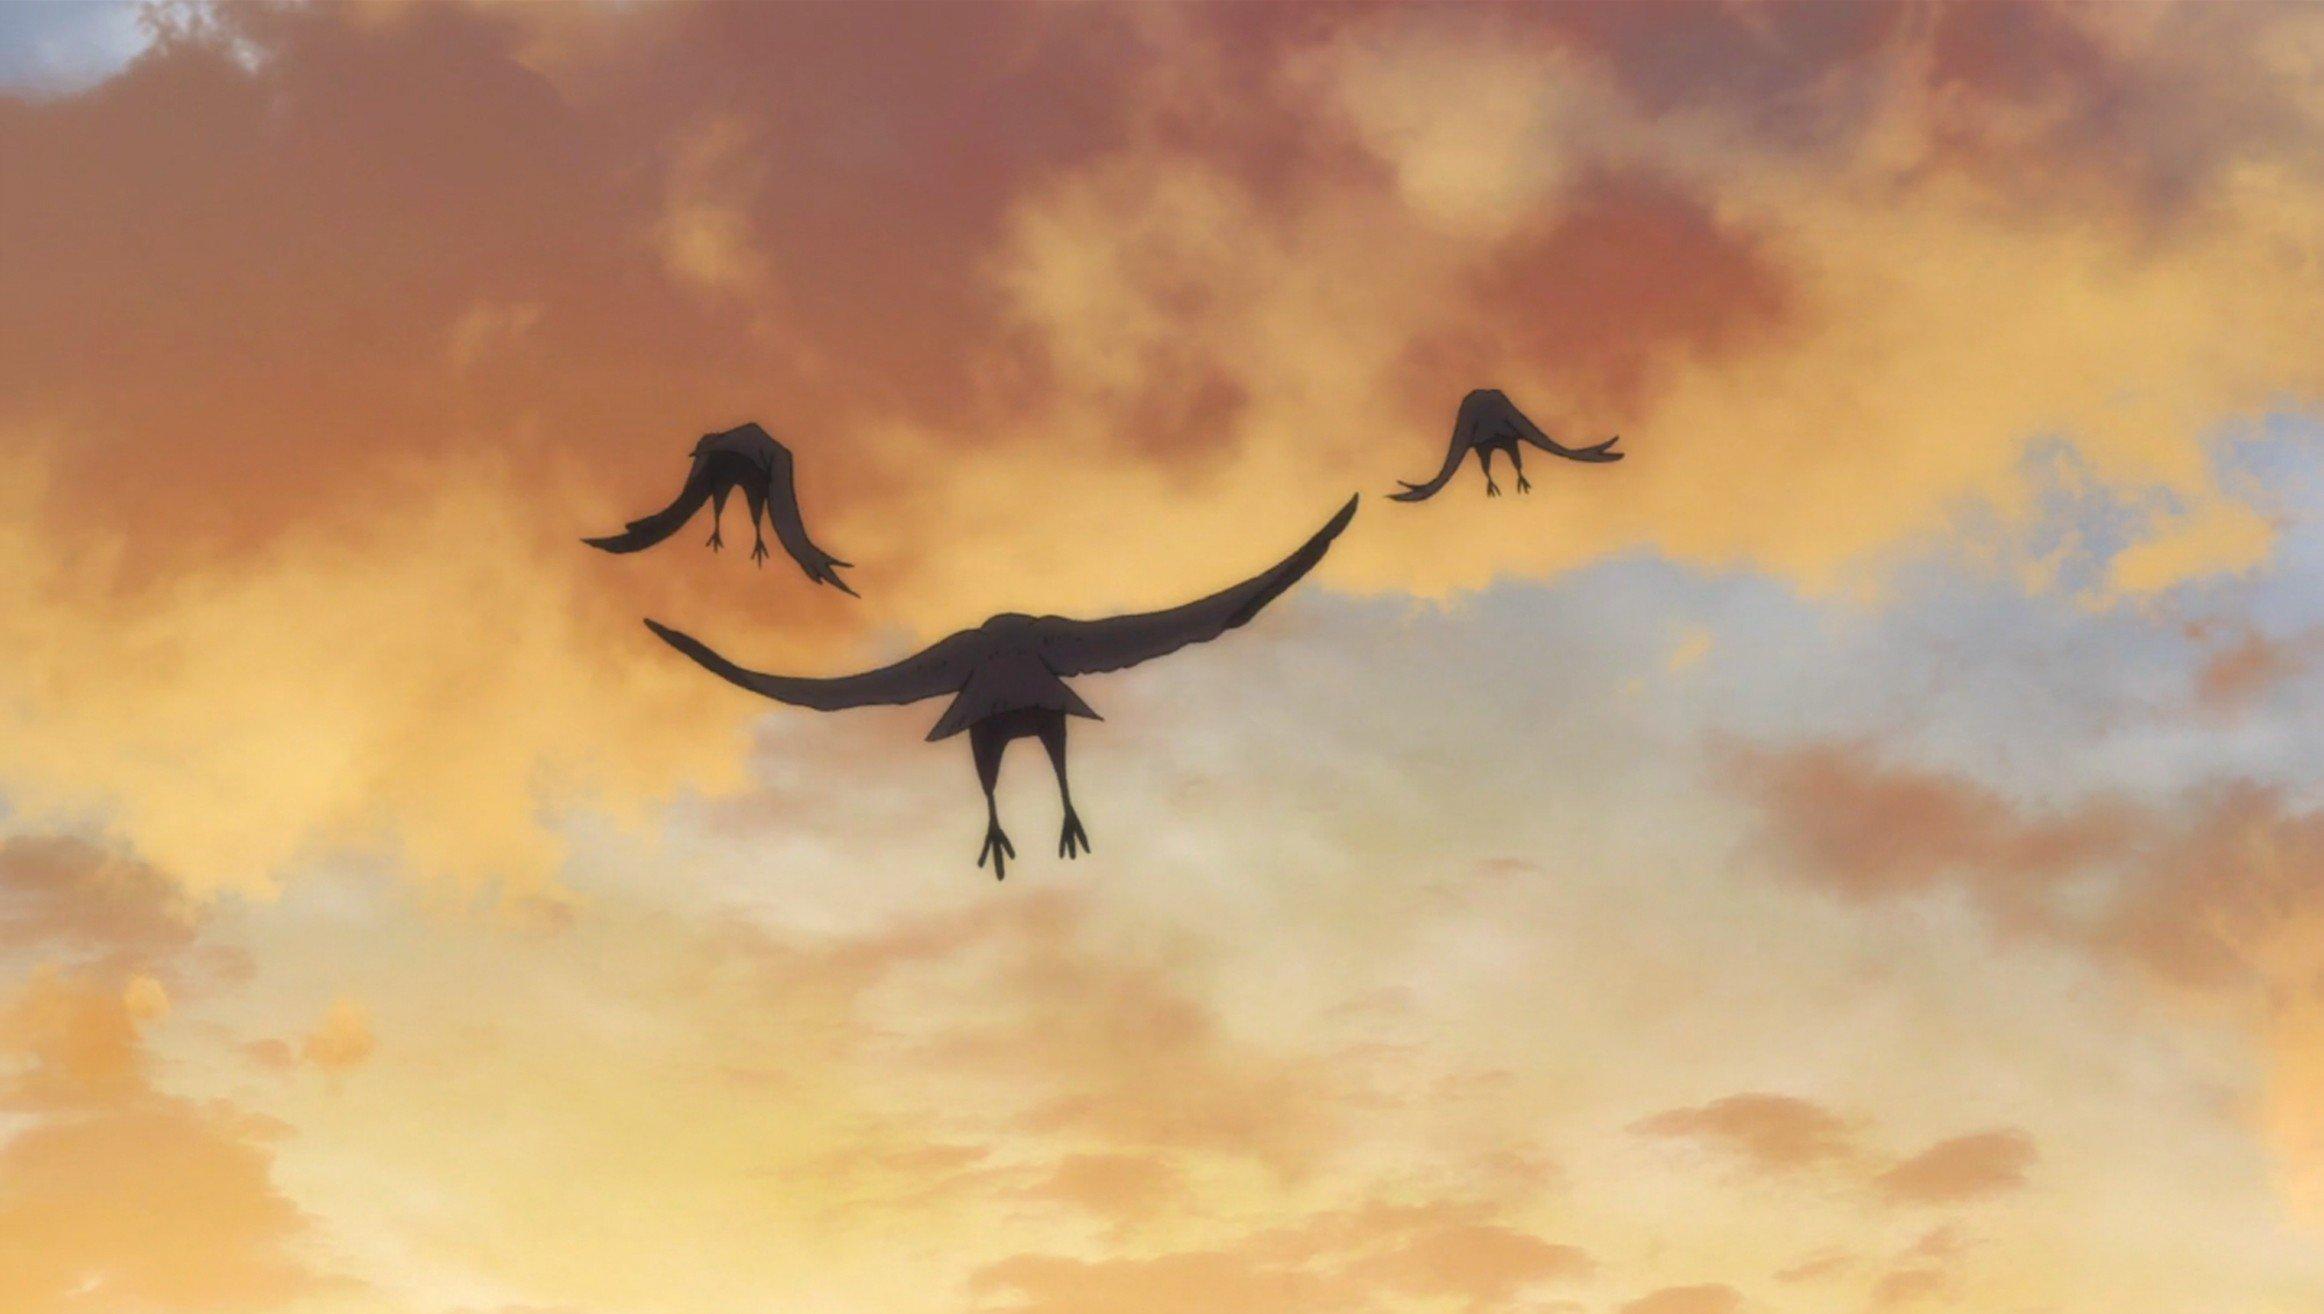 Haikyuu!!, Crow, Anime, Anime art HD Wallpapers / Desktop ...